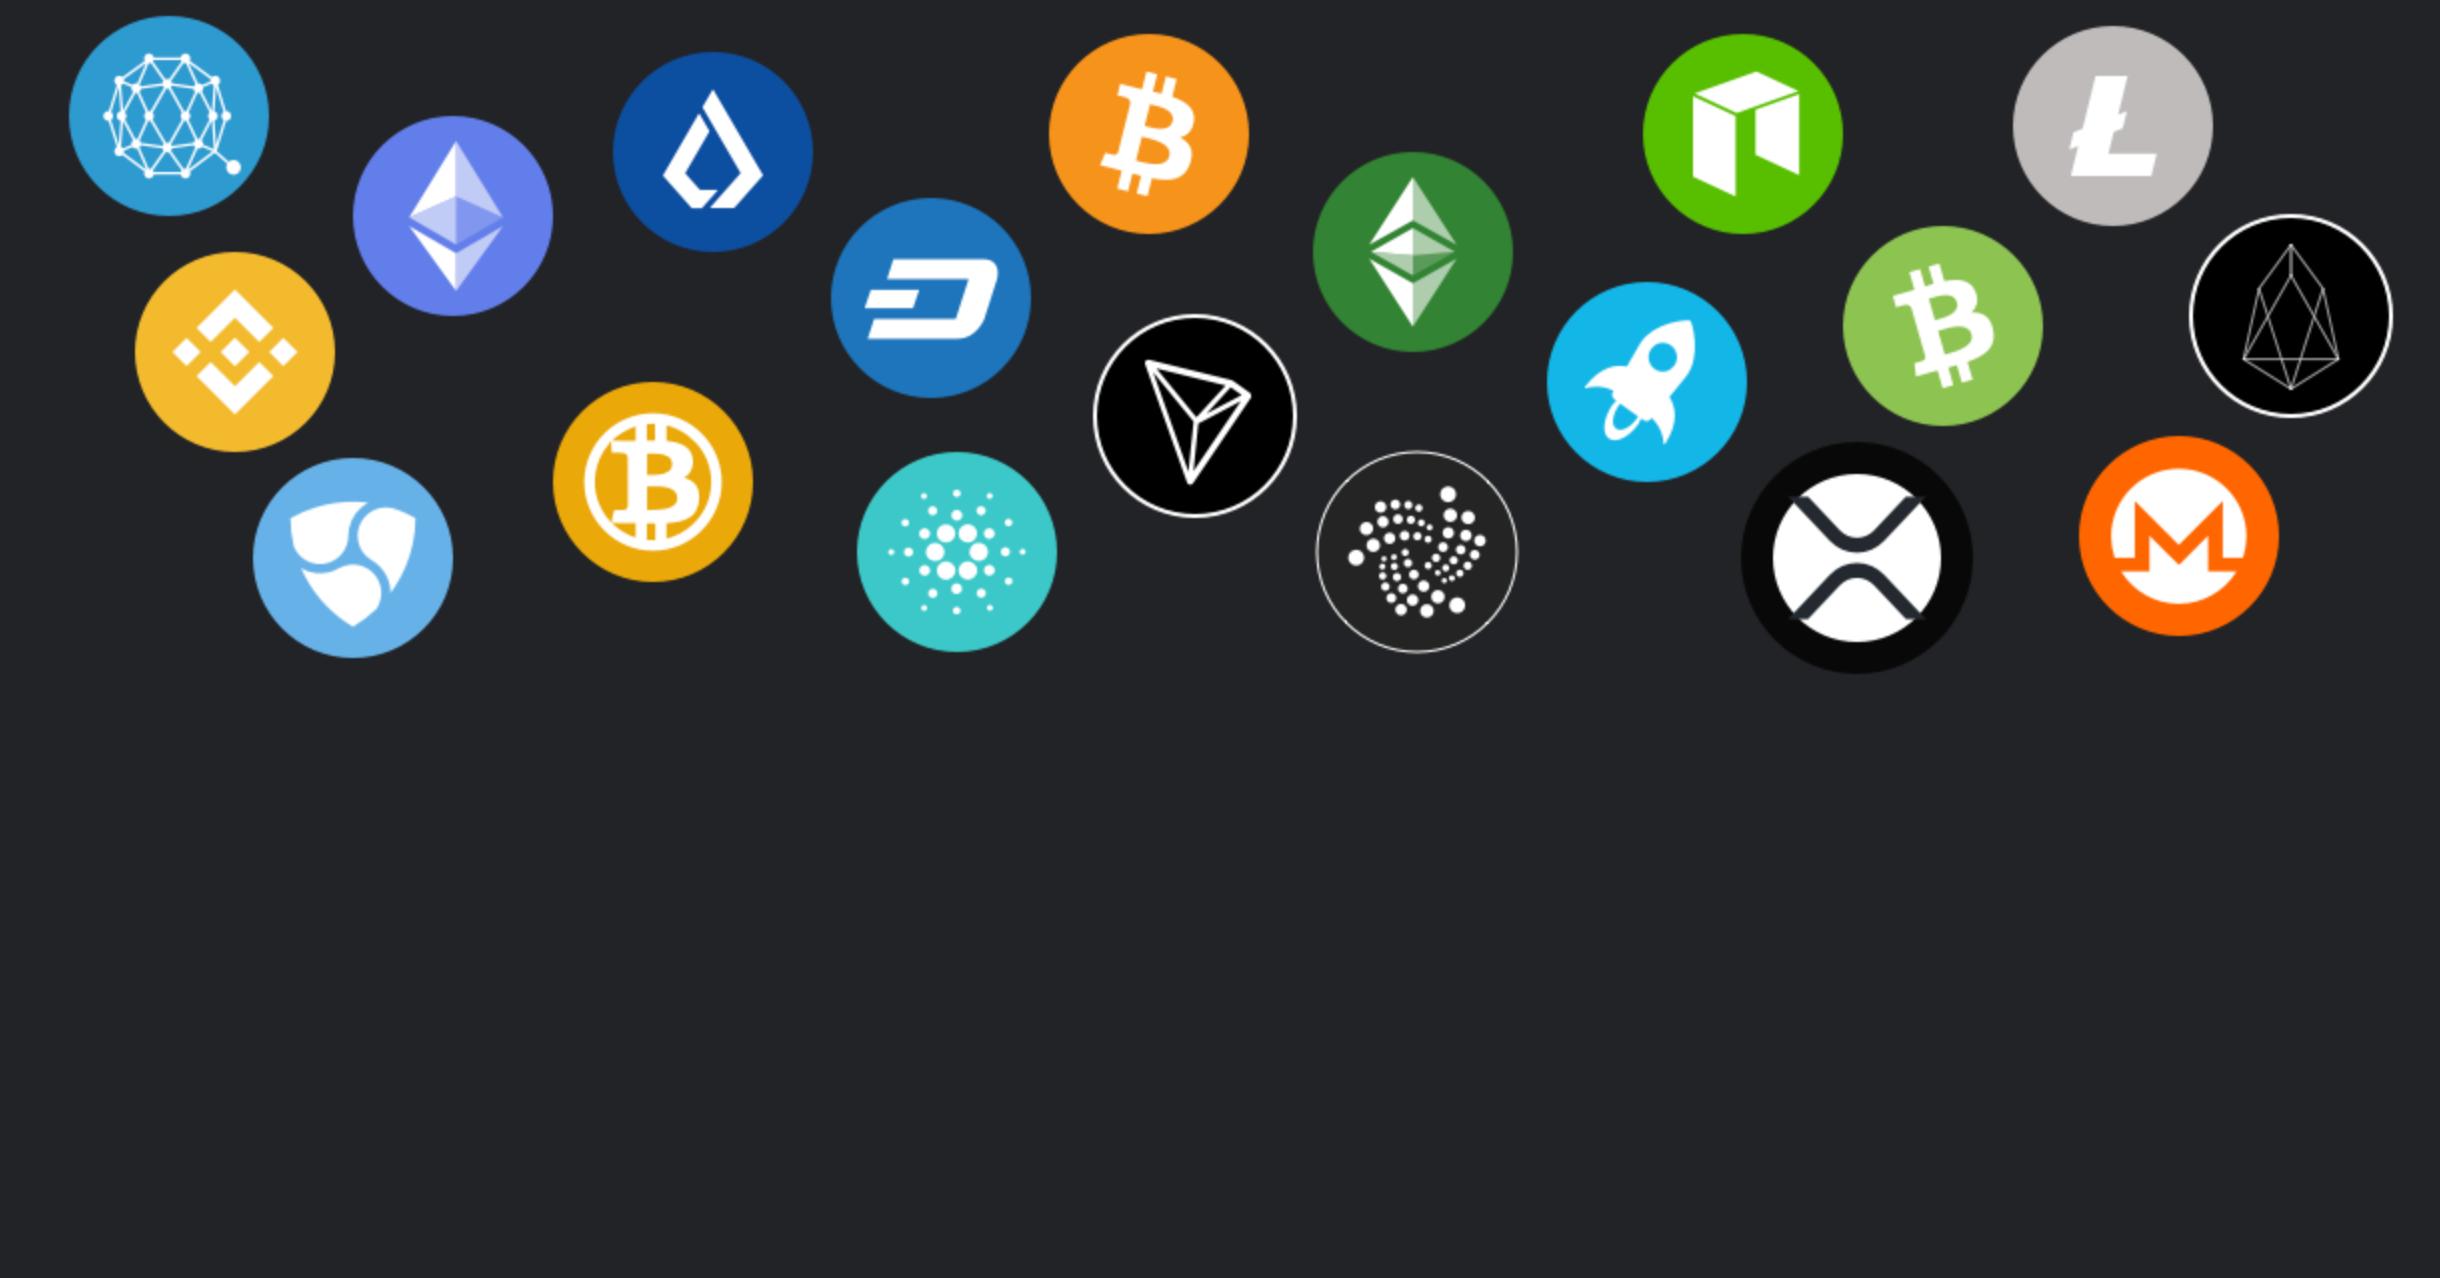 bitcoin halving sonrasi kripto piyasalarda son durum